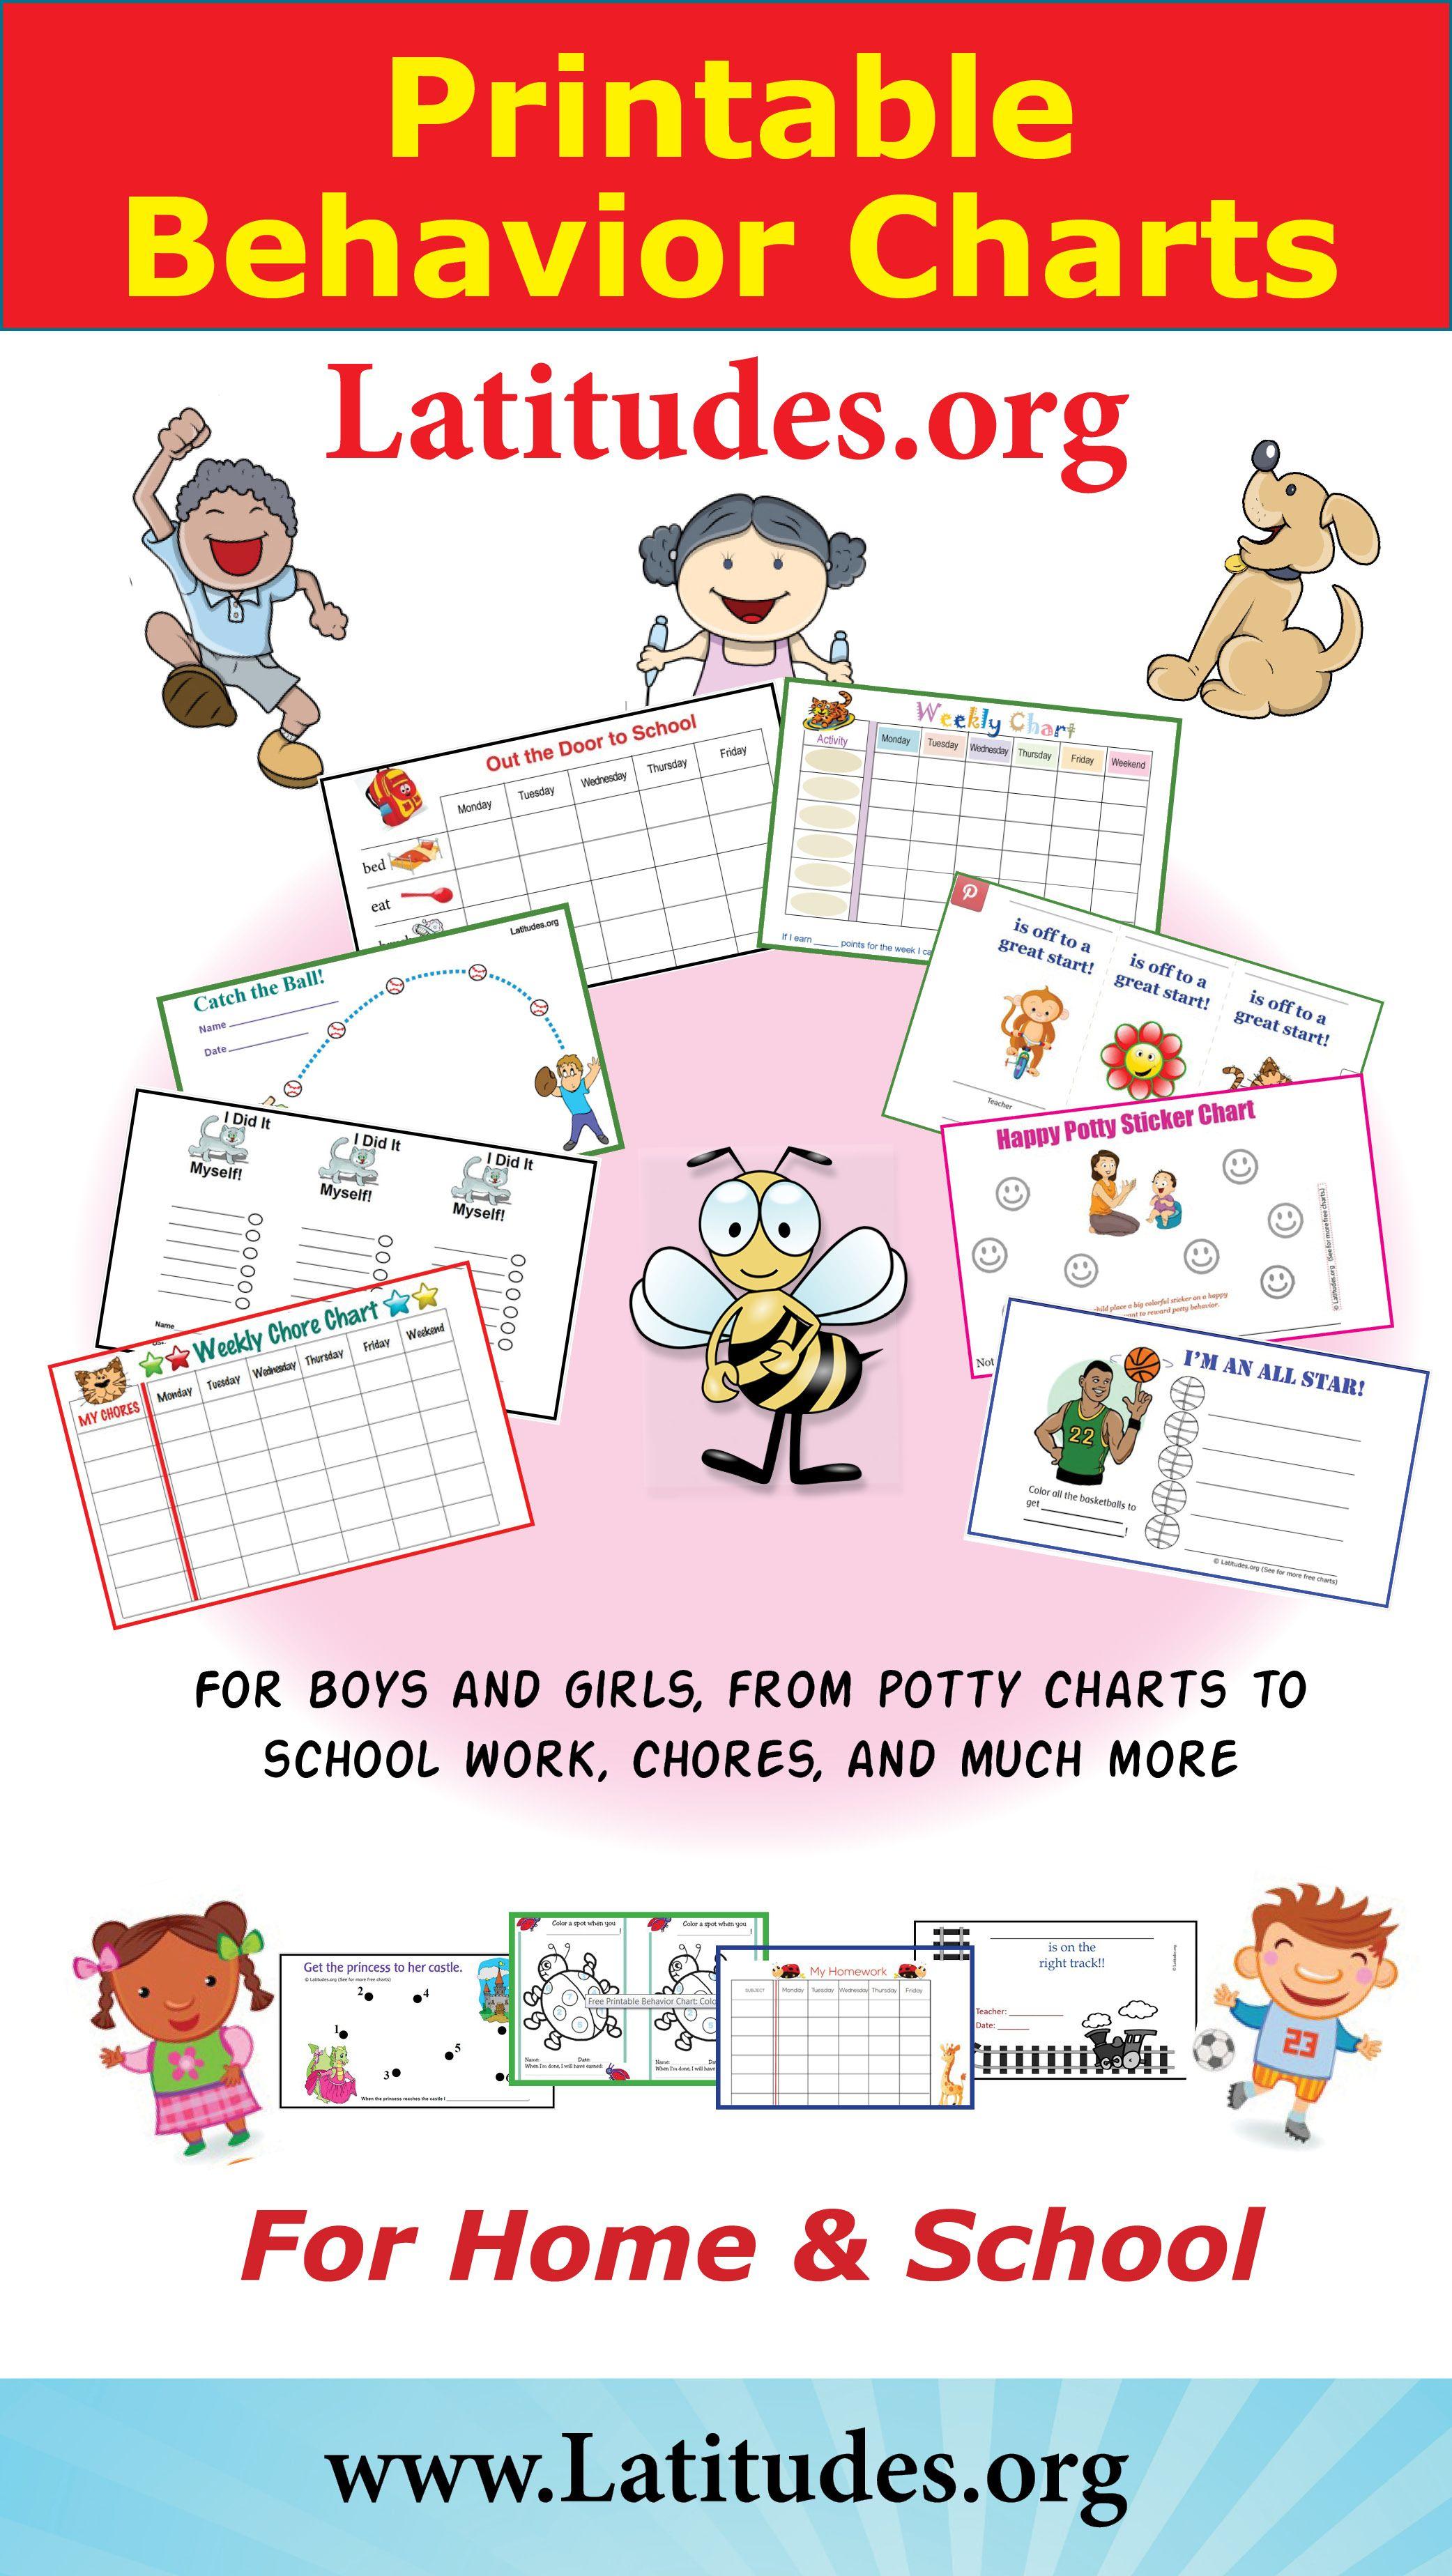 Free Printable Behavior Charts For Home And School | Behavior Charts - Free Printable Charts For Teachers